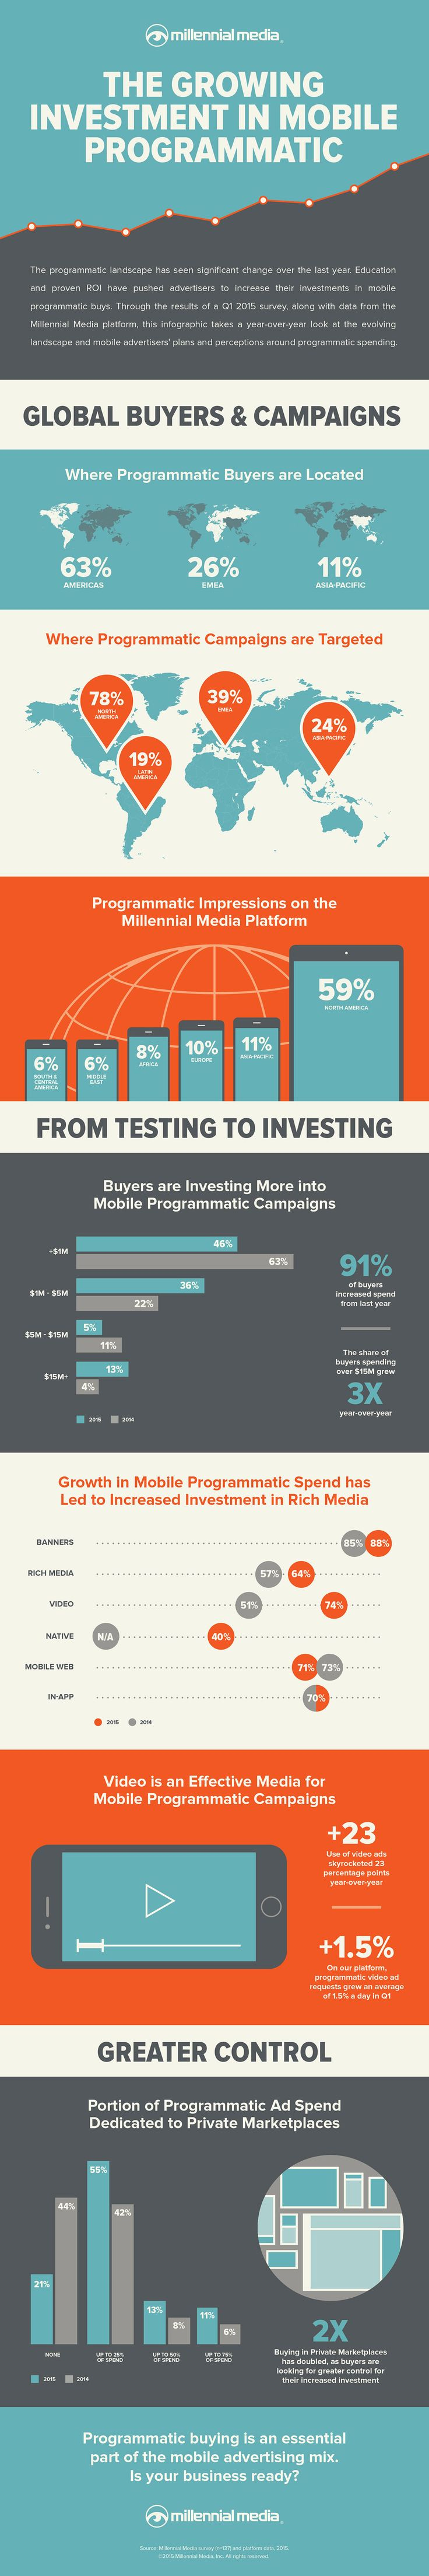 Mobile Programmatic grows #RideTheMobileTsunami